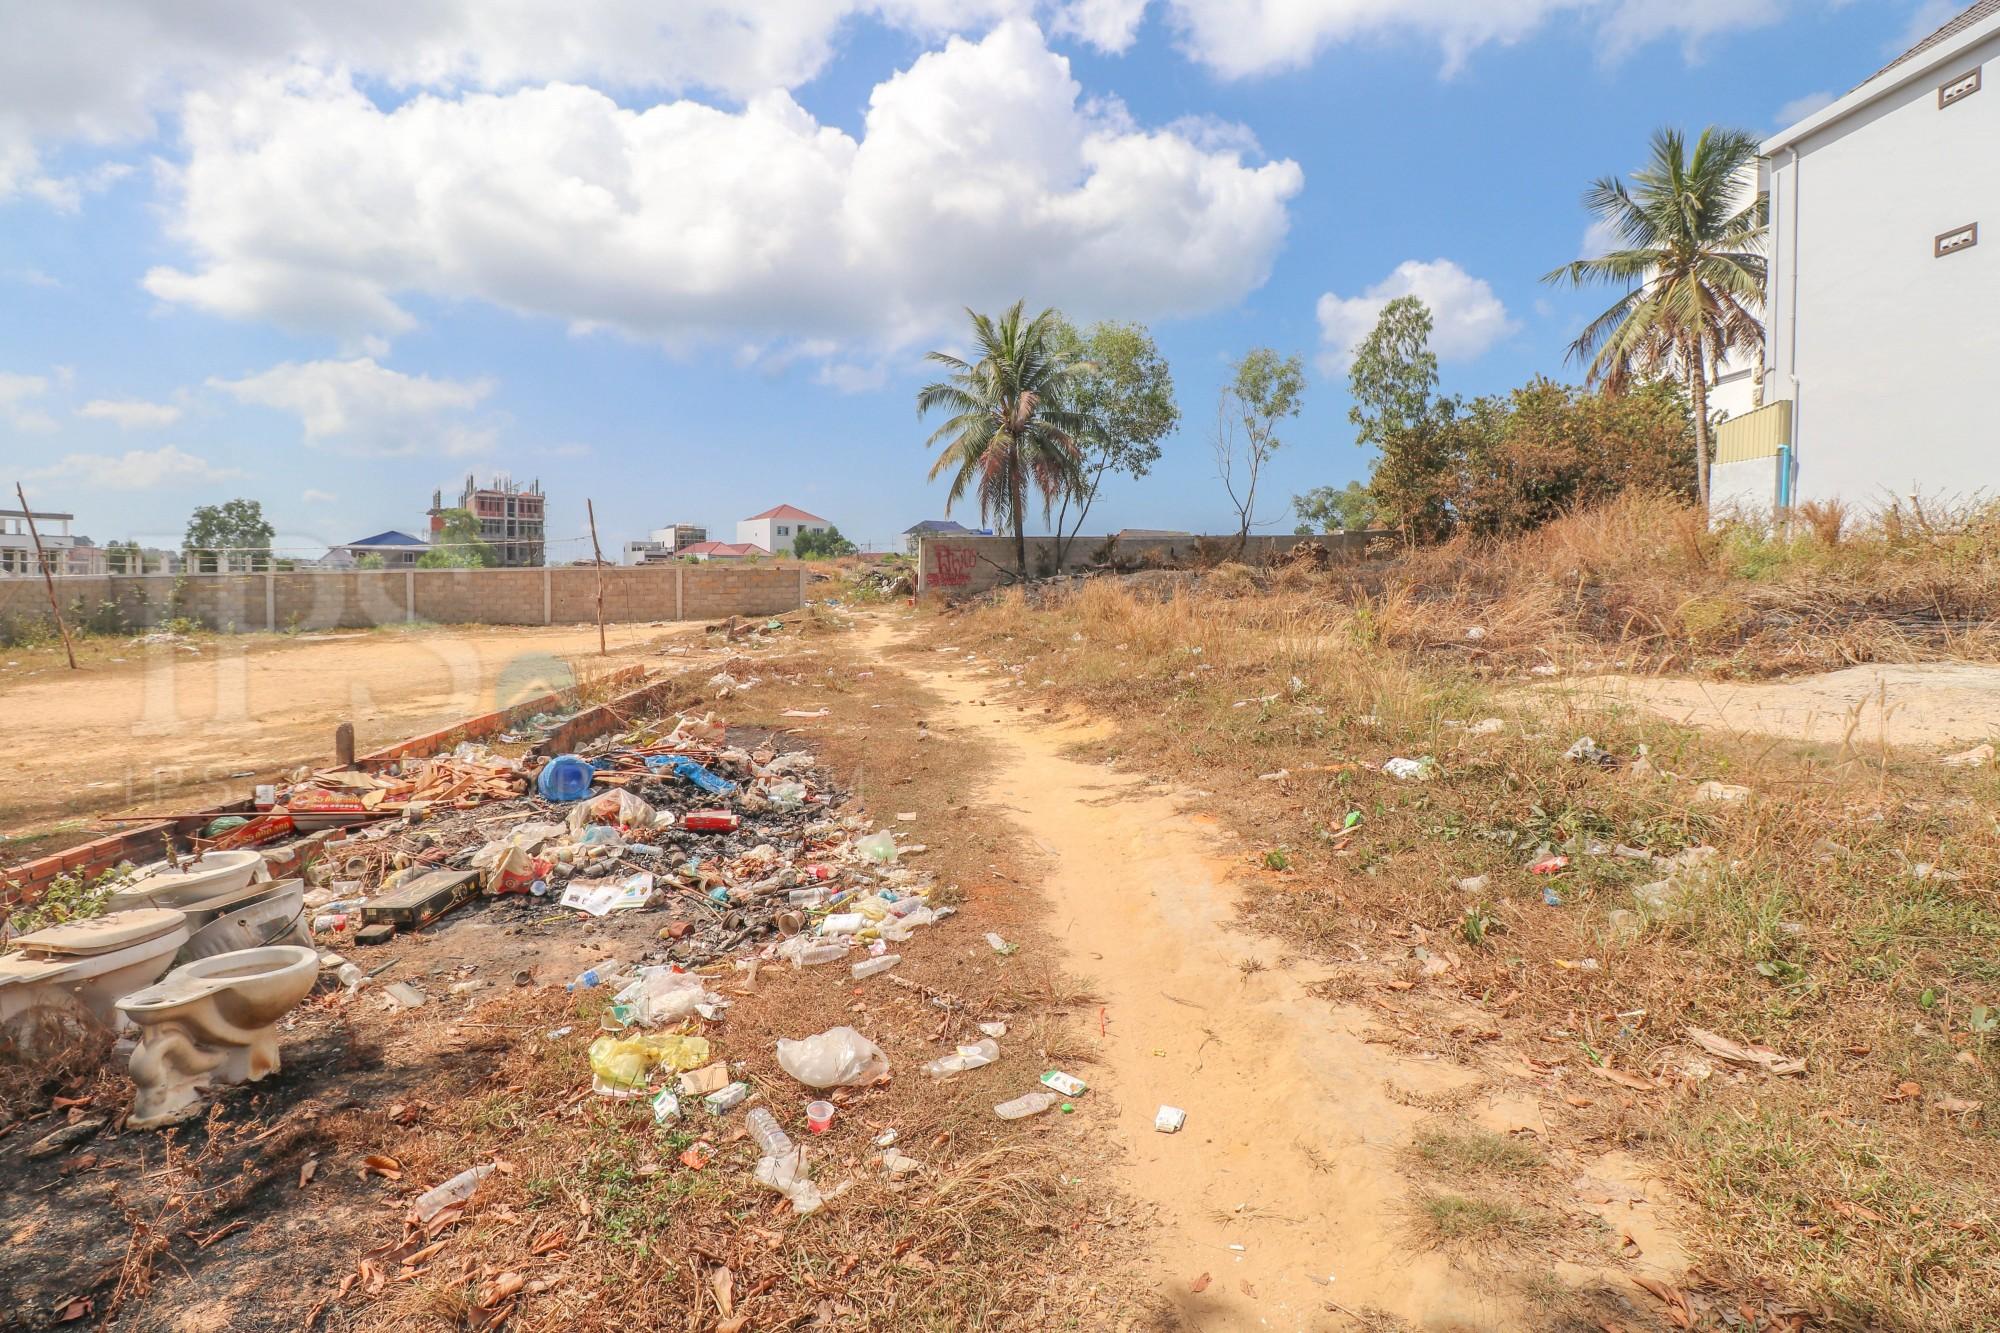 515 sq.m. Land For Rent - Mittapheap, Sihanoukville